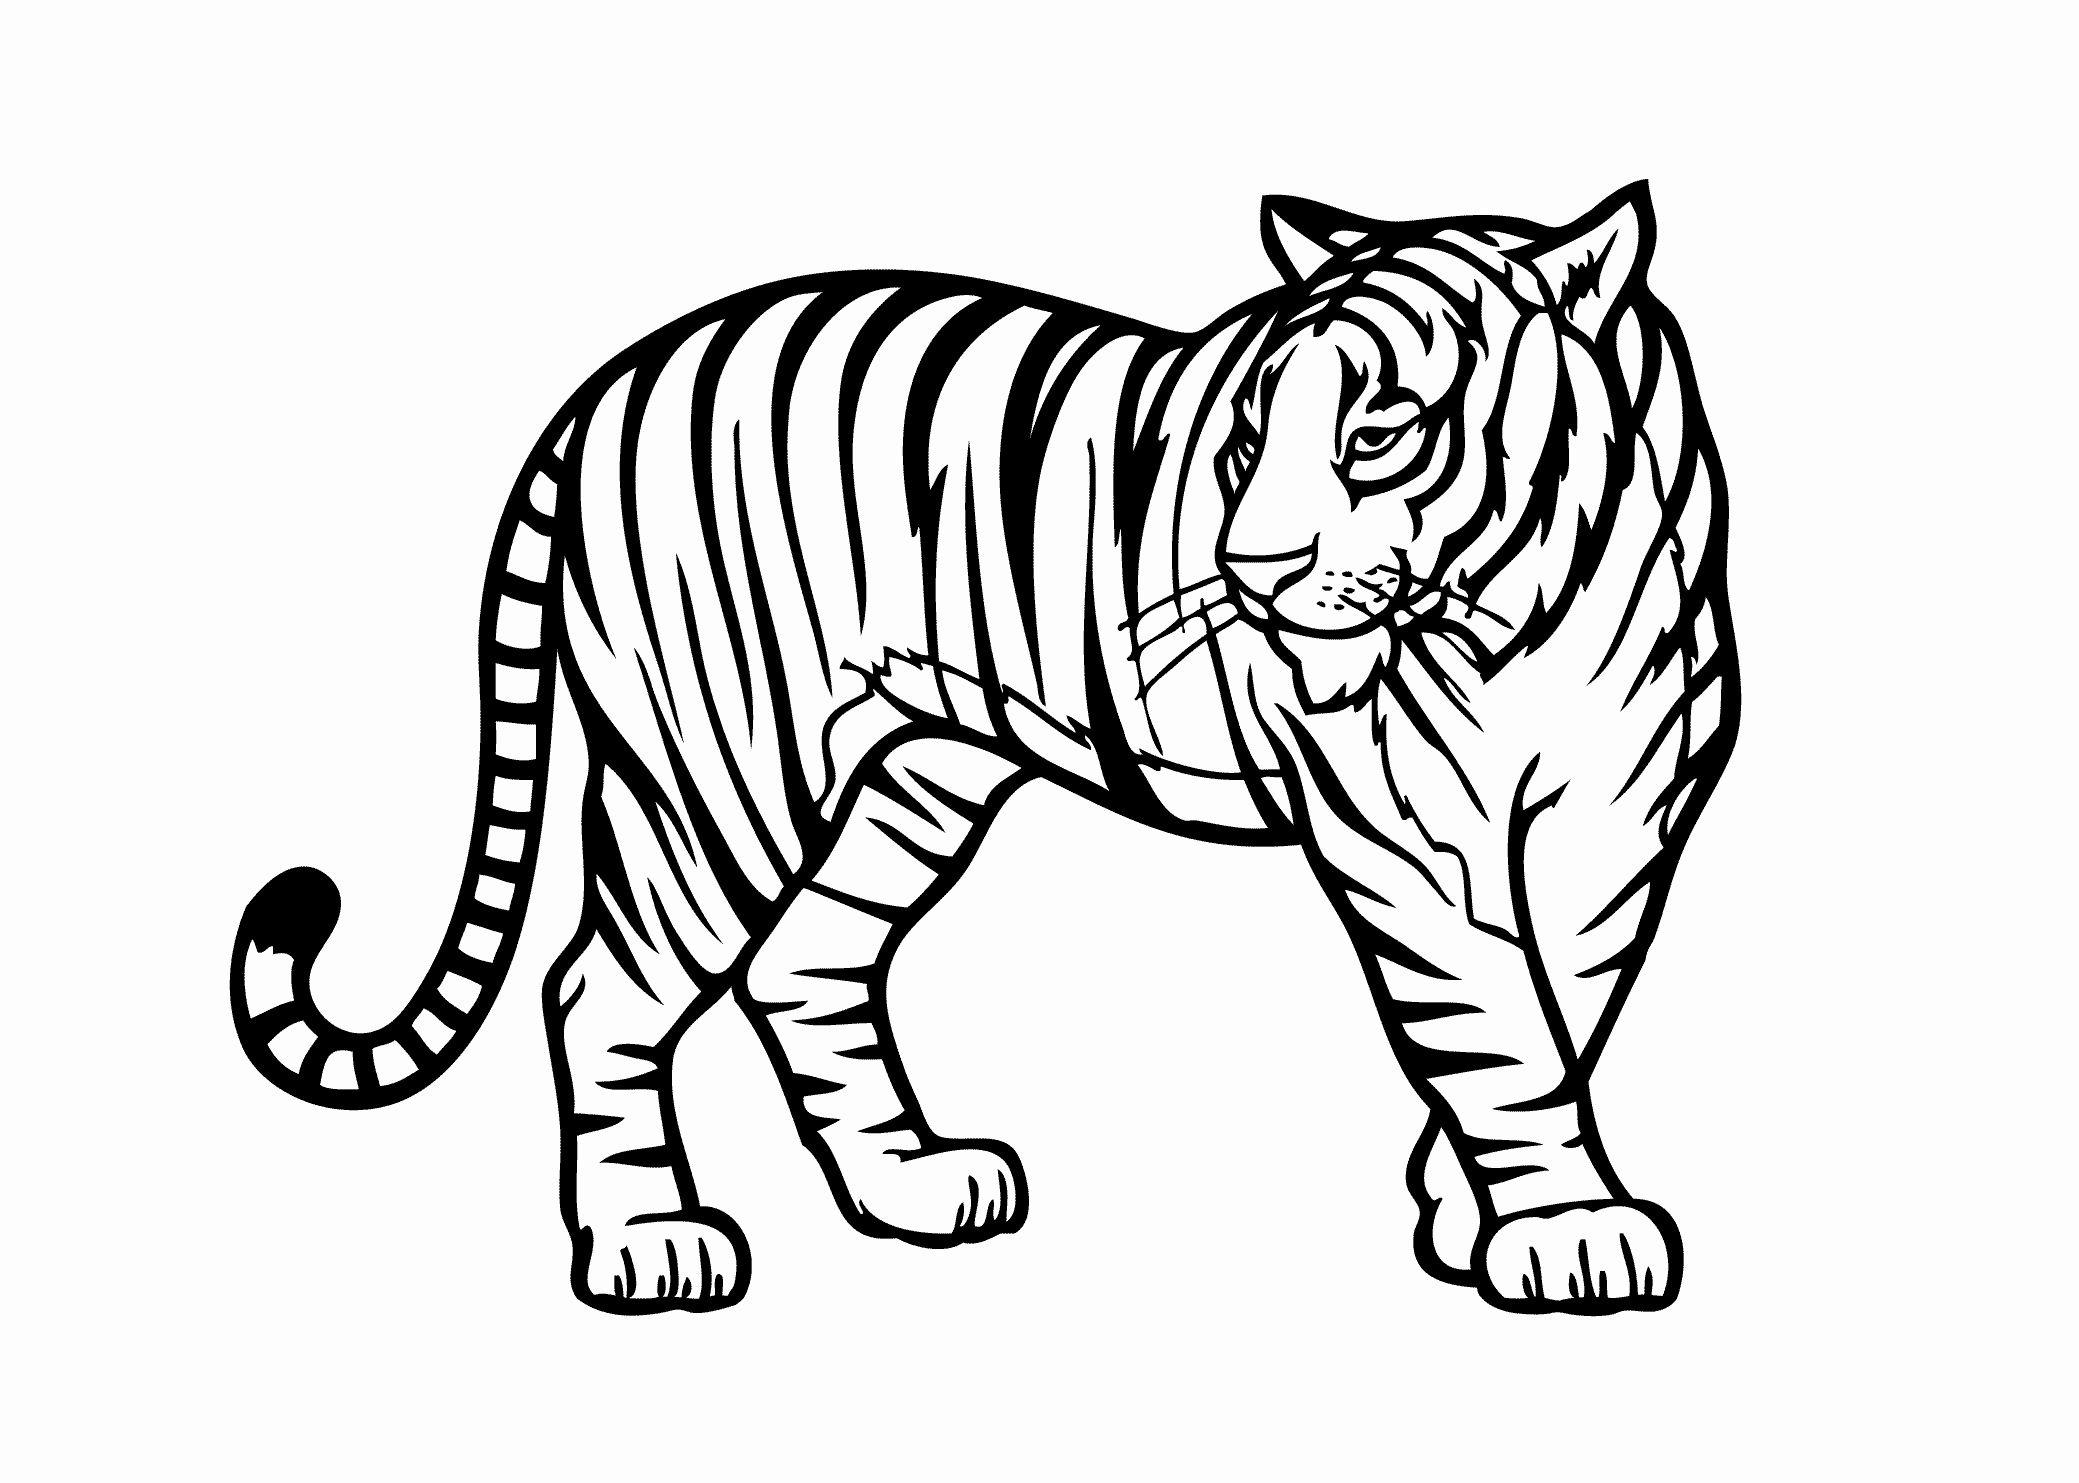 Tiger Coloring Pages Tiger Coloring Pages 3 Lrg Tiger Face